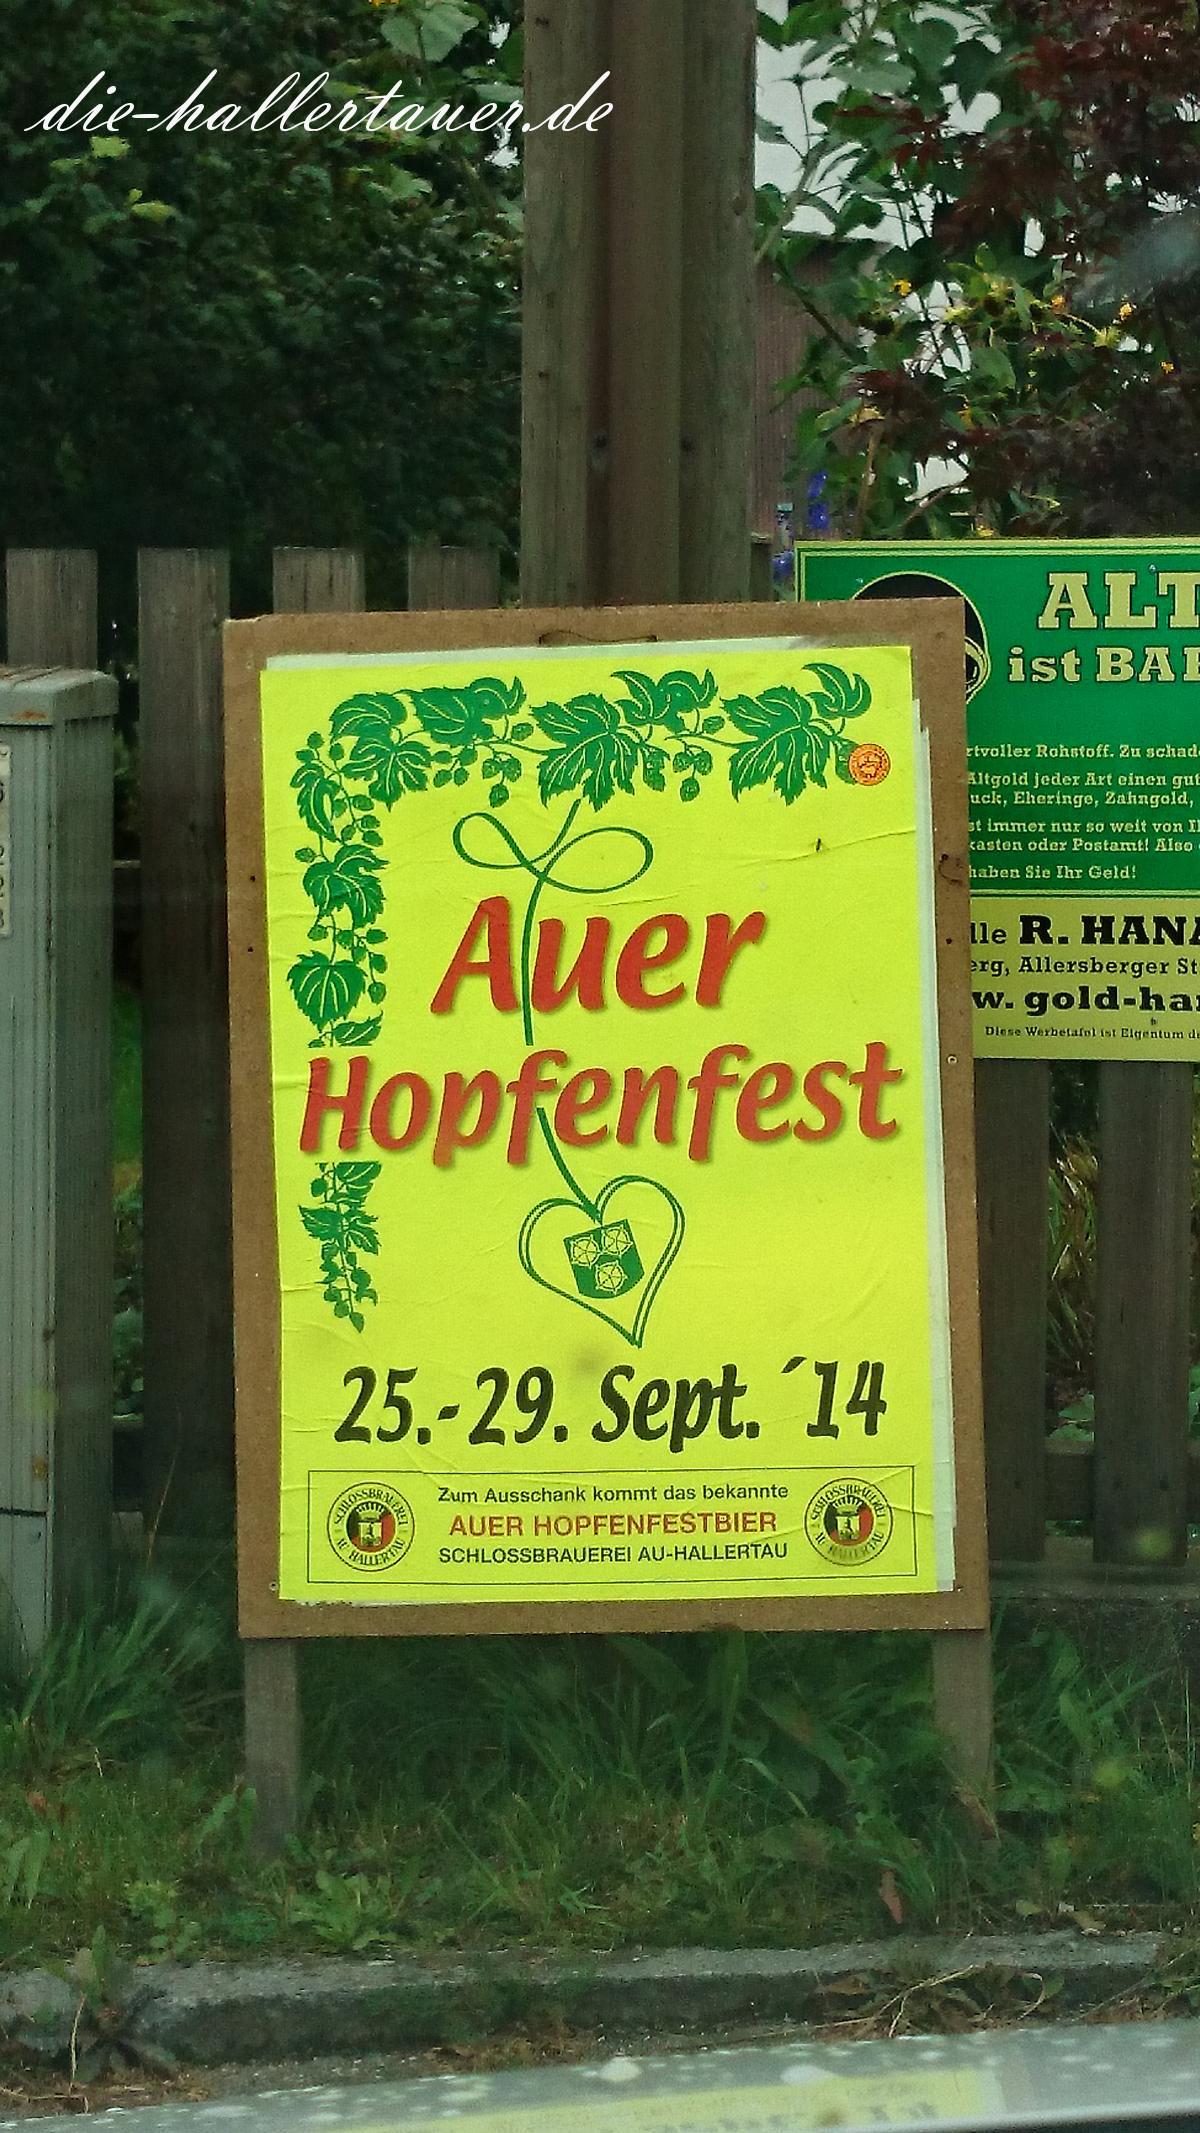 Auer Hopfenfest